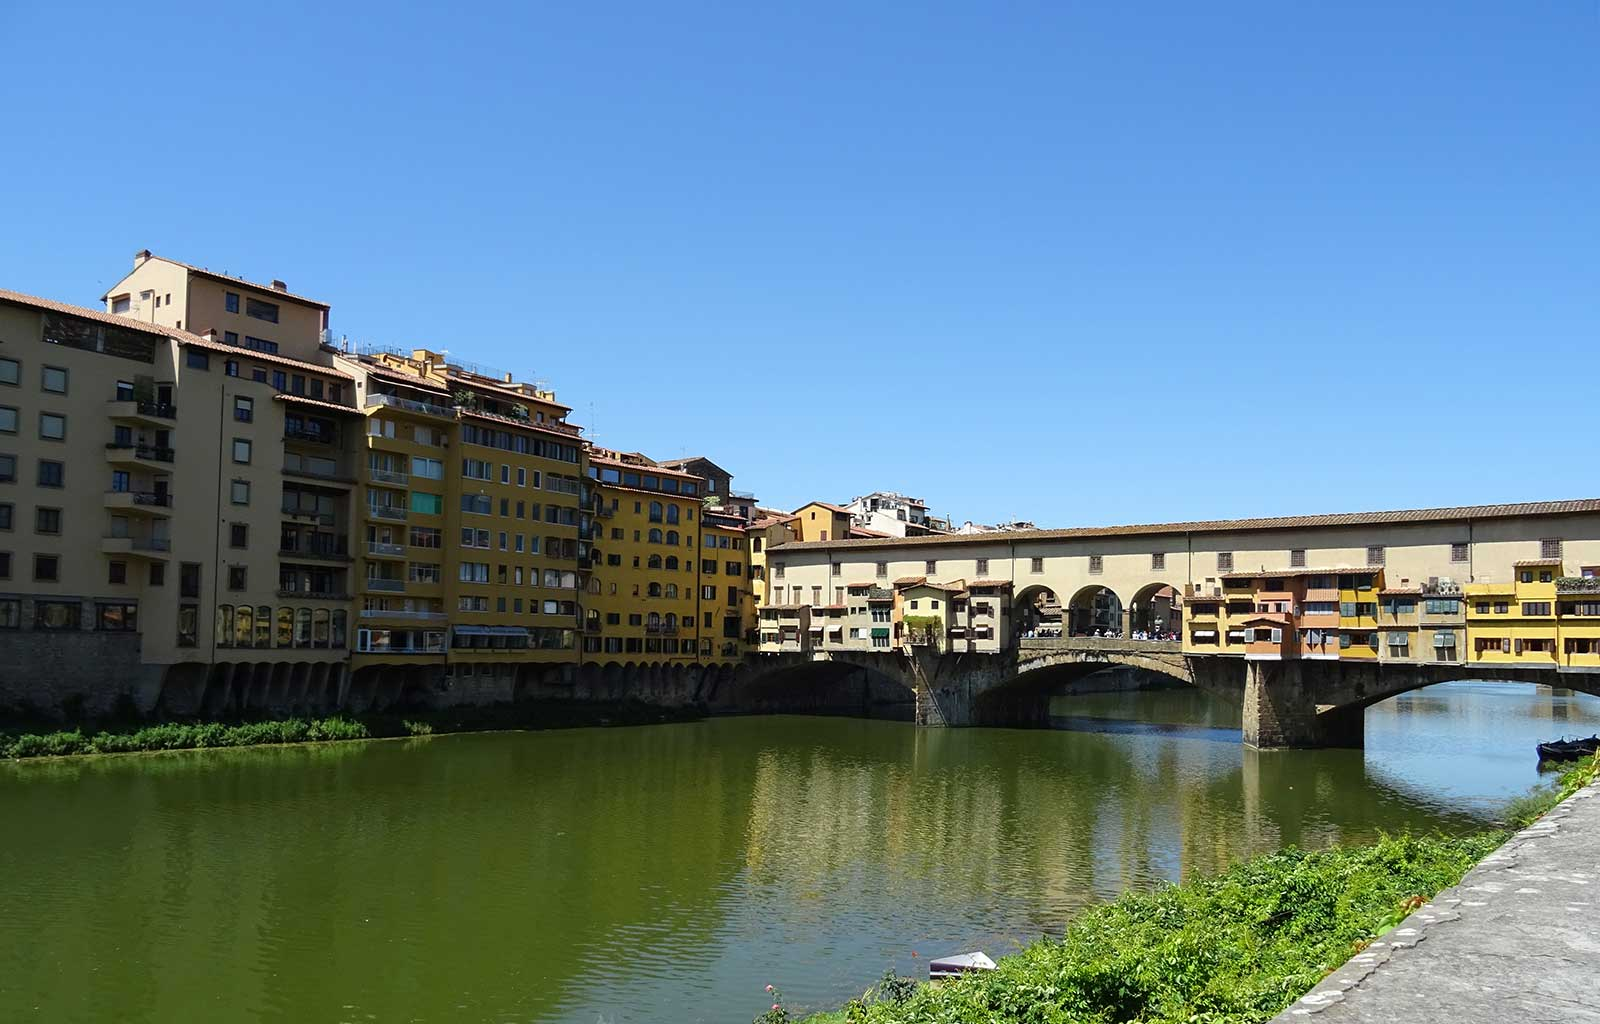 Voyage italie toscane Florence ponte vecchio